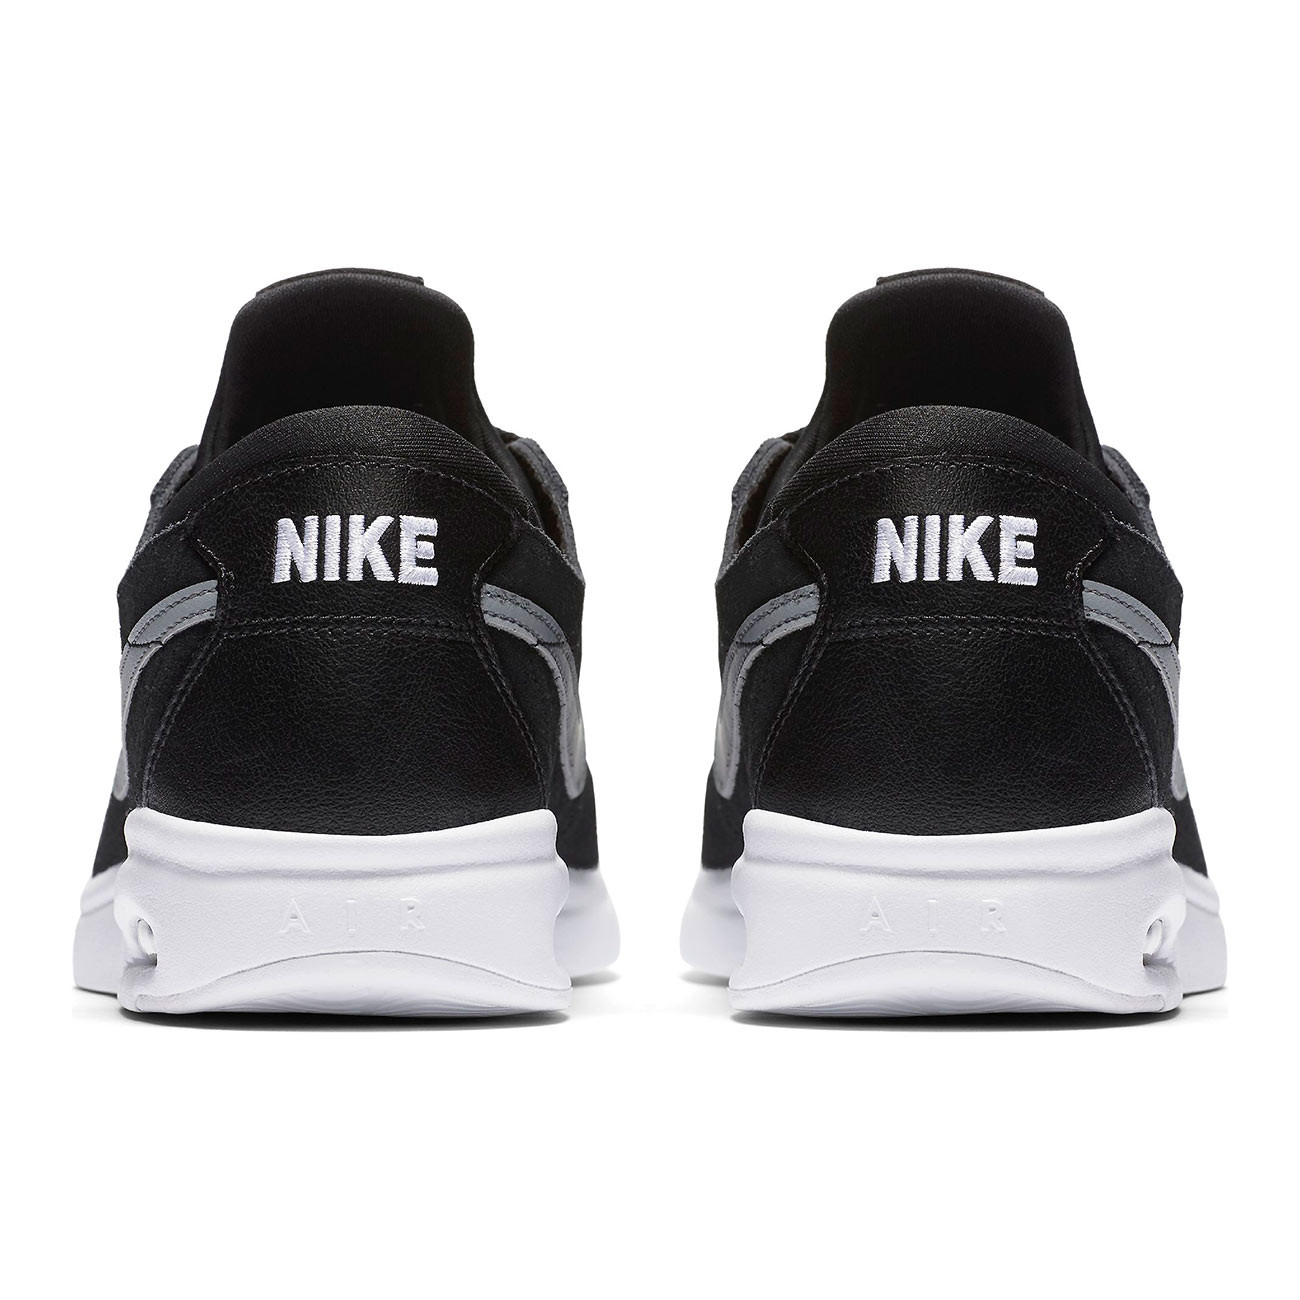 491171f0e98 Tenisky Nike SB Air Max Bruin Vapor black cool grey-white-white ...